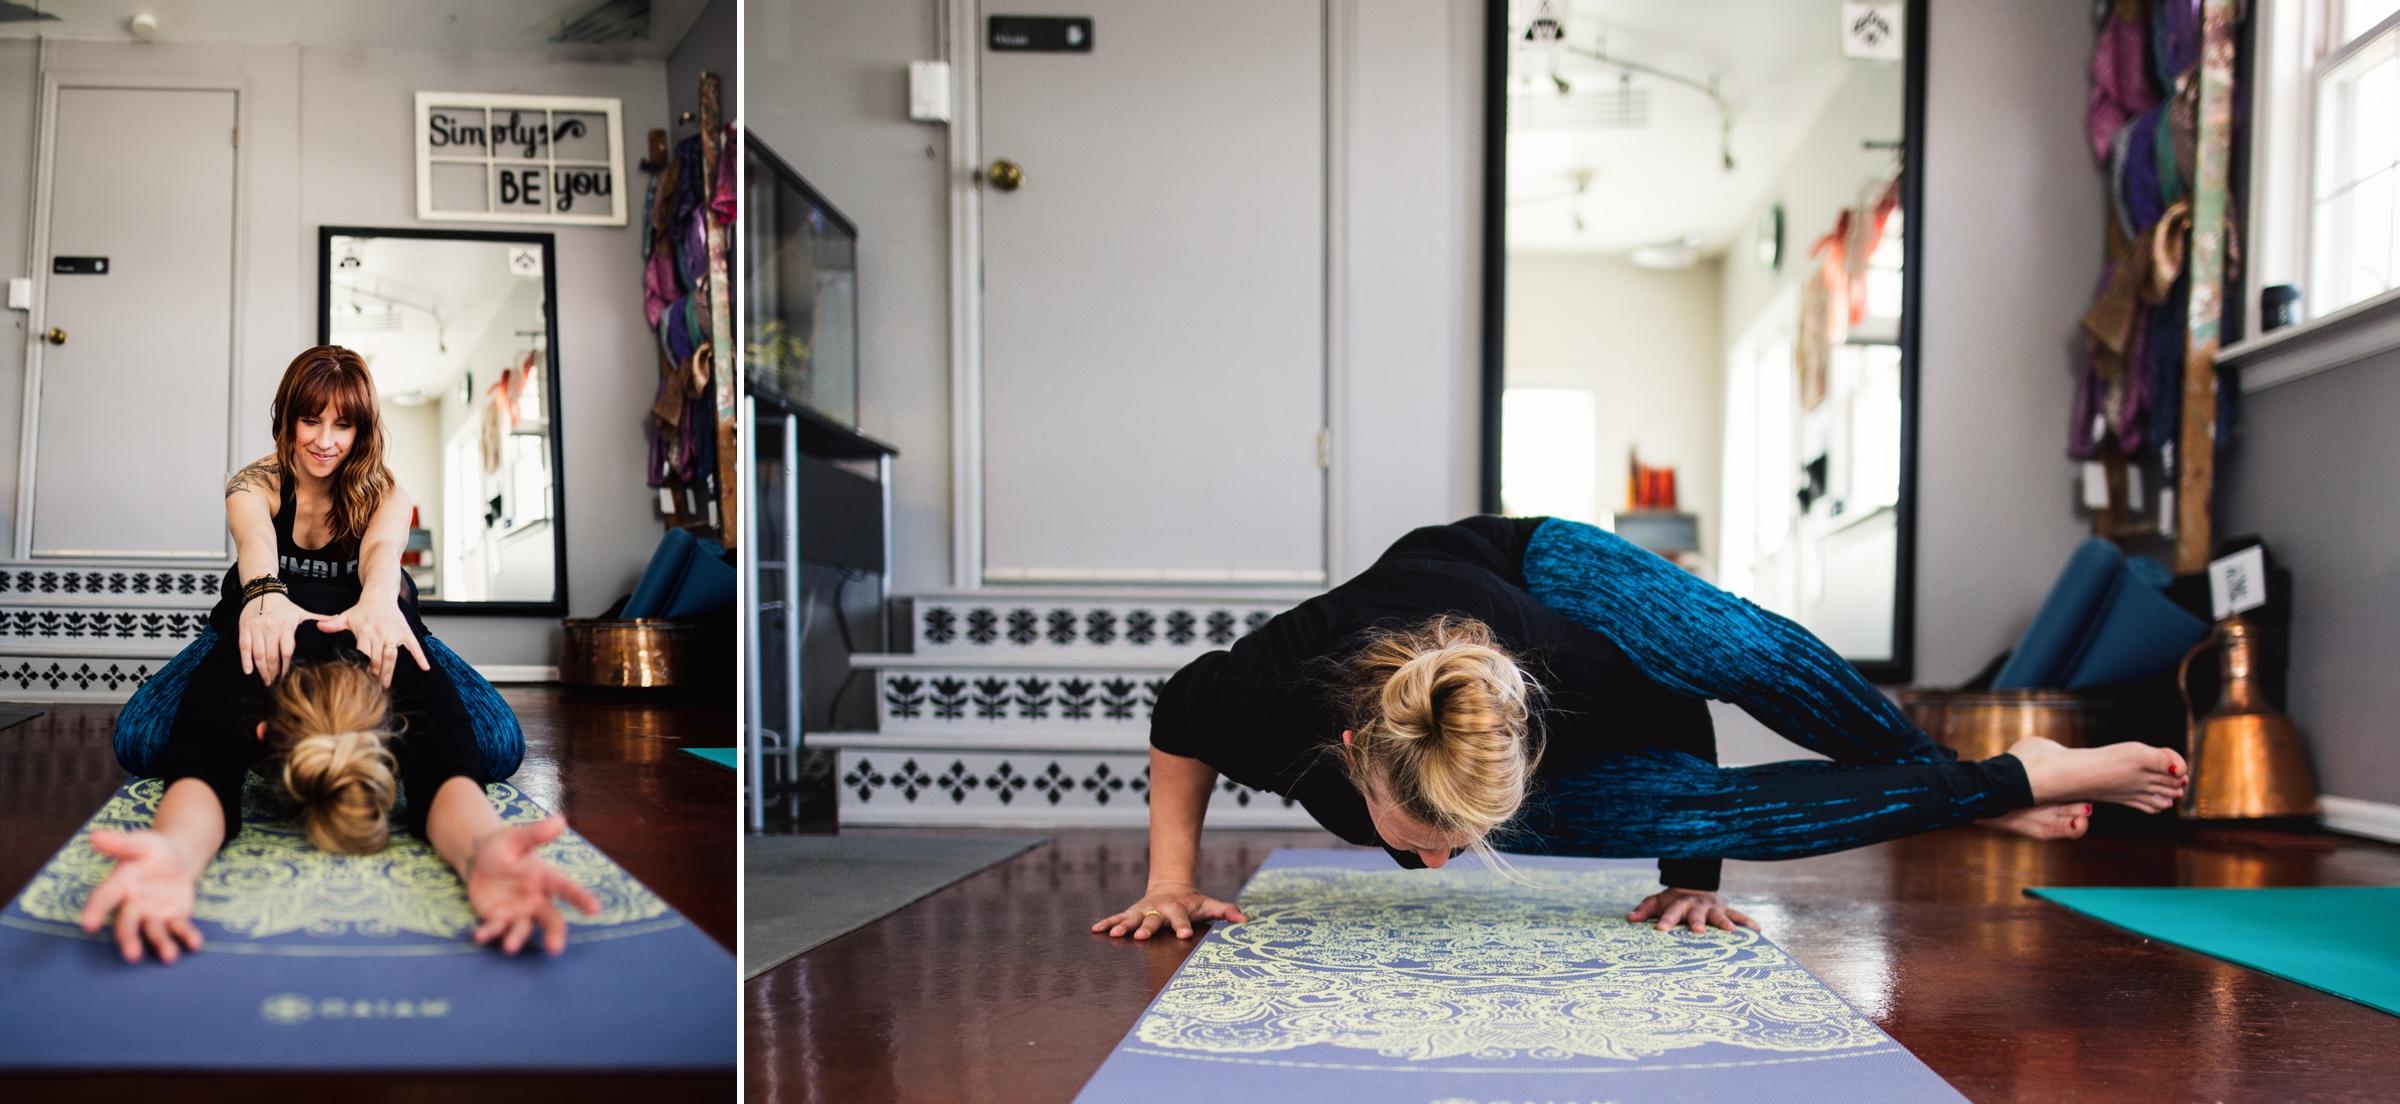 denver yoga studio, yoga studio, therapy yoga studio, colorado social medial photographer